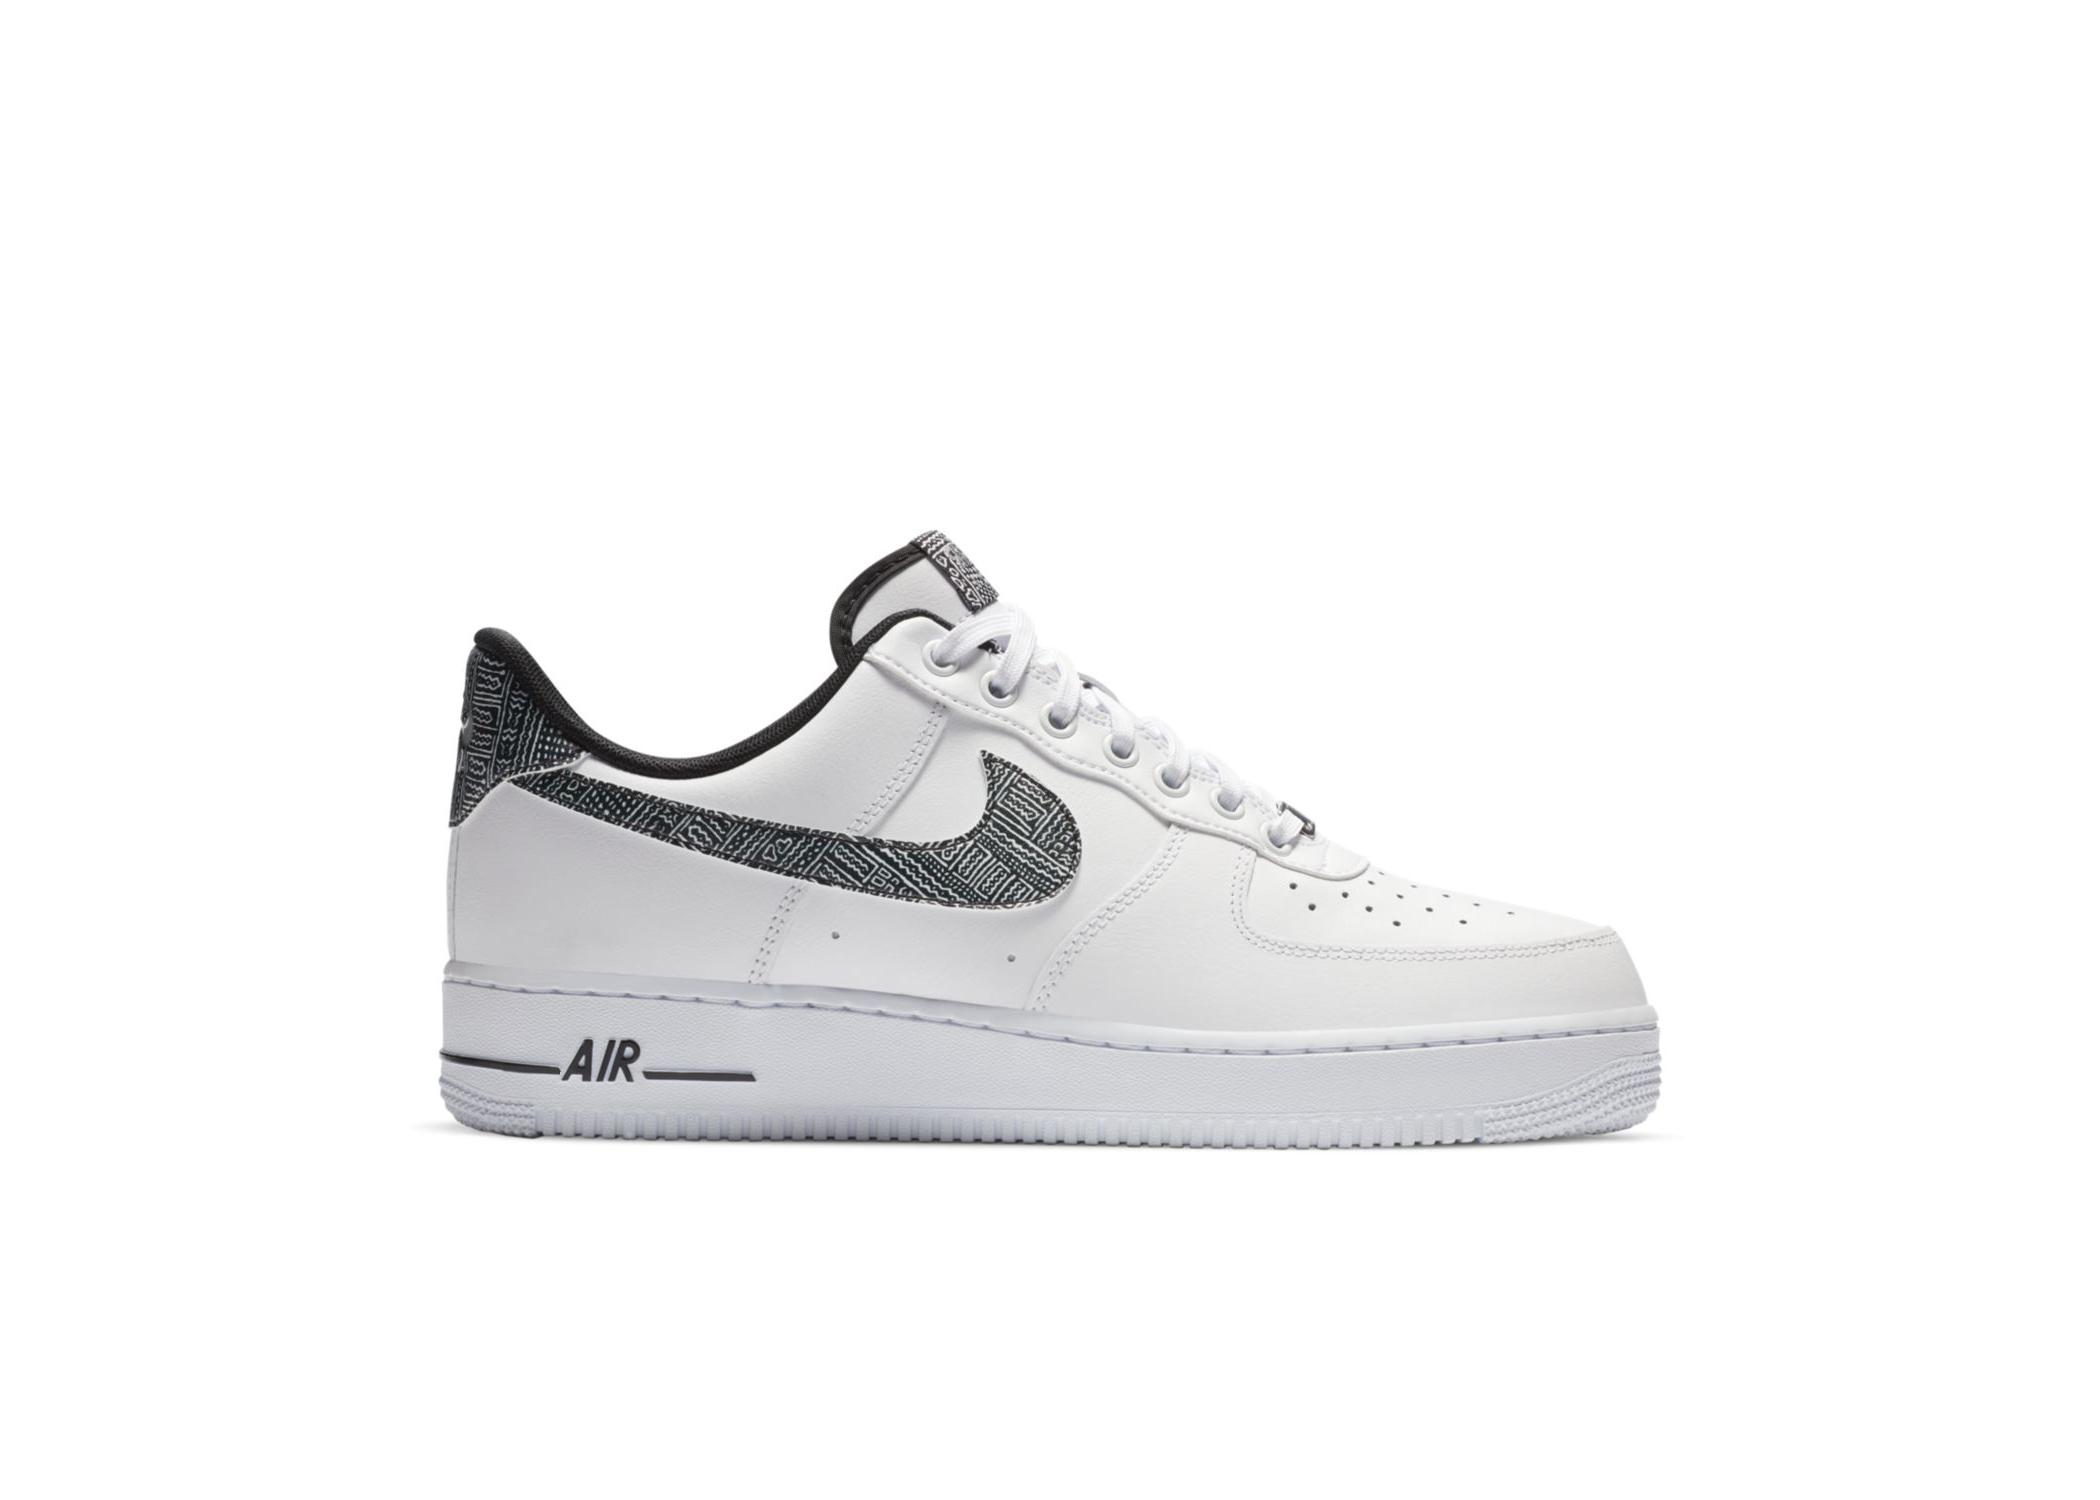 Nike Air Force 1 '07 White Metallic